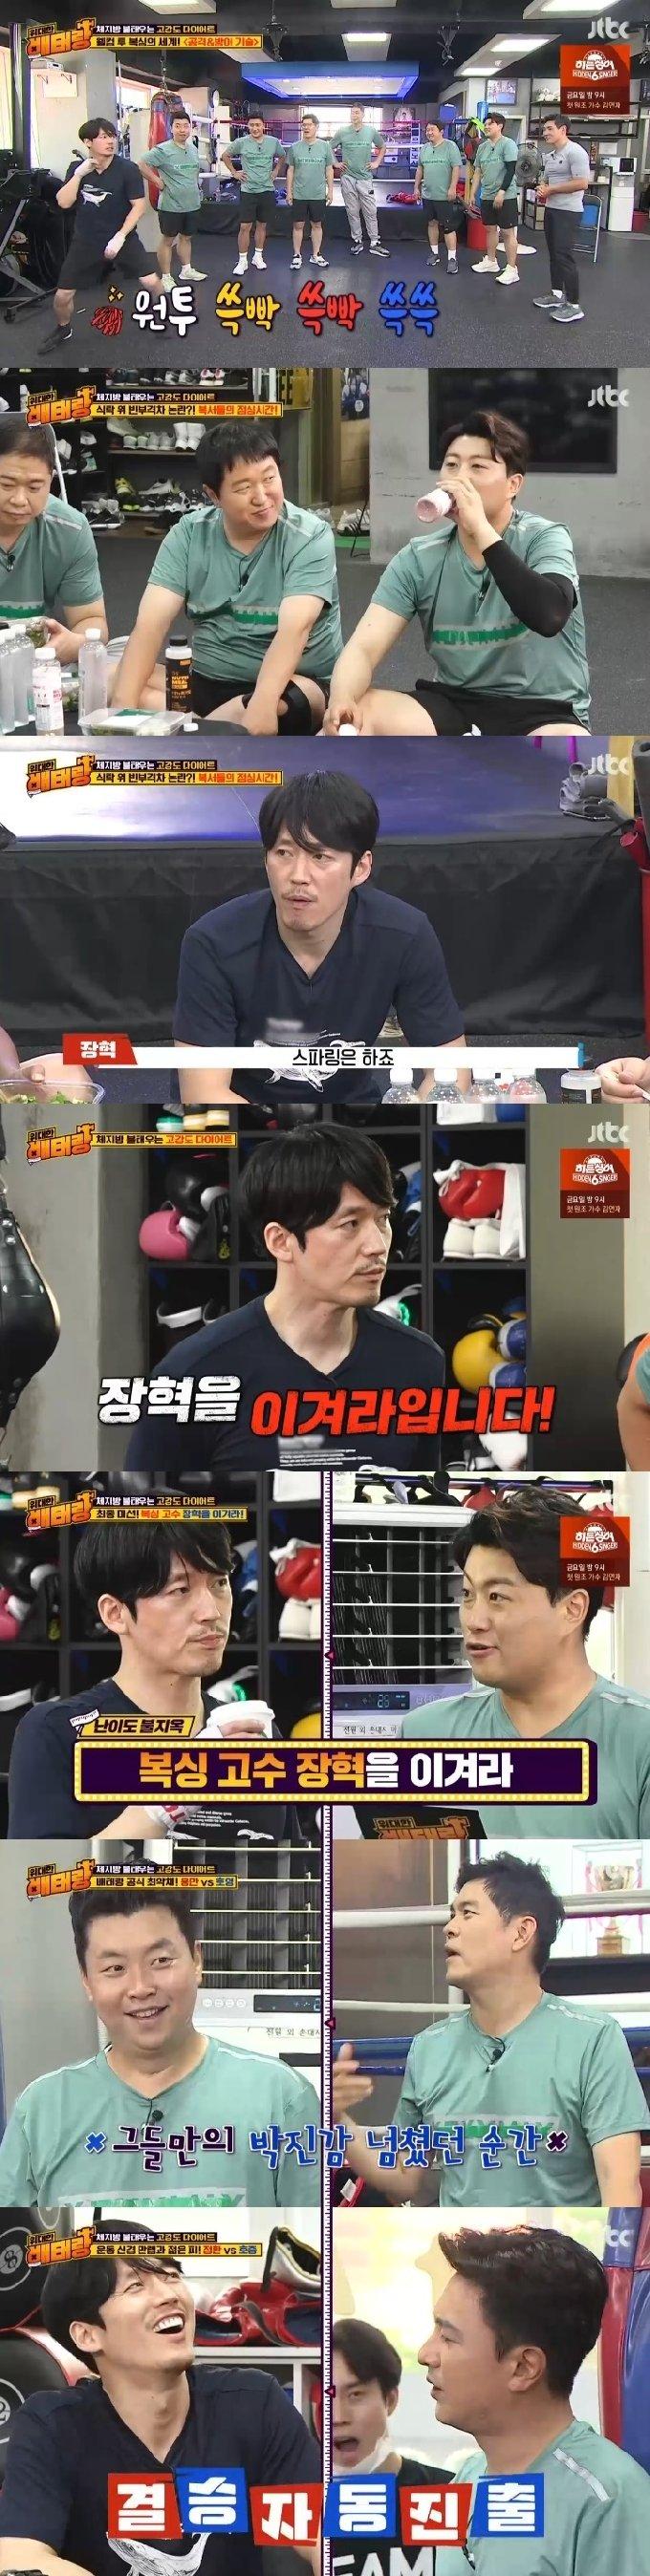 JTBC '위대한 배태랑' 캡처 © 뉴스1